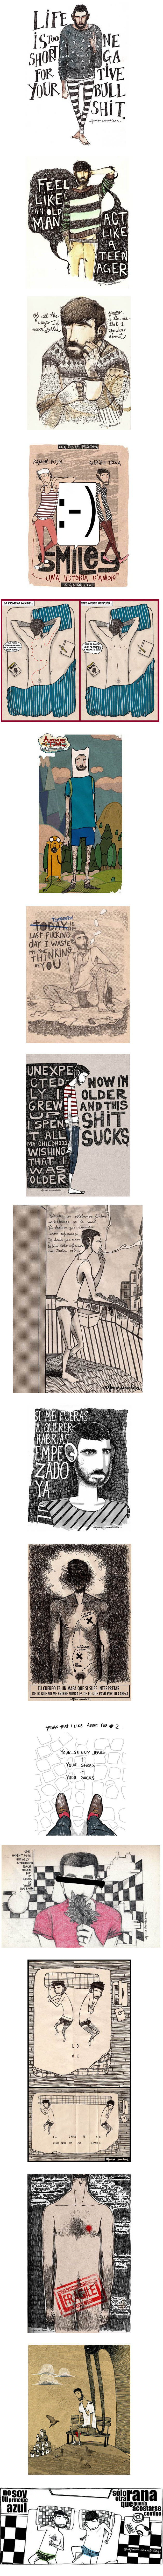 S.U.C.K. //  G.U.B.A.N.C.O.K. - Alfonso Casas Moreno